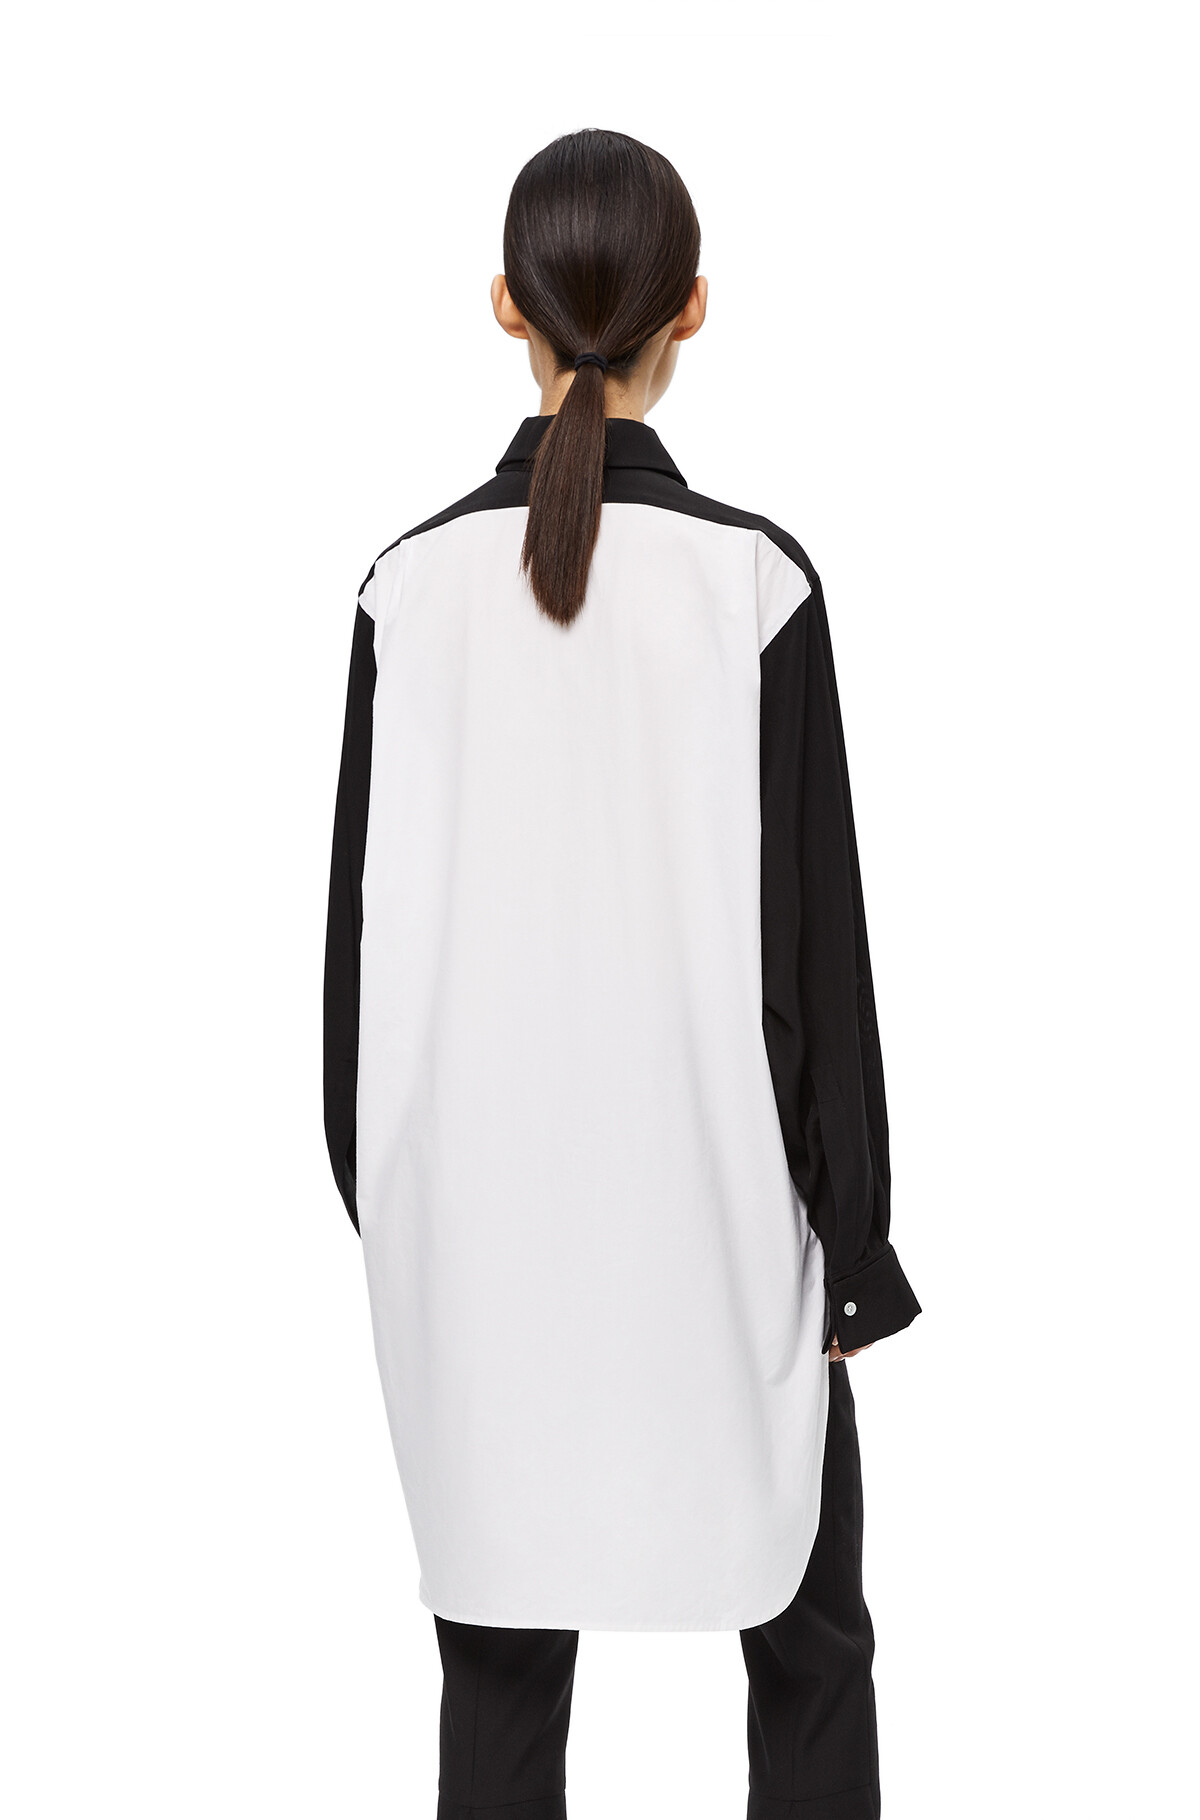 LOEWE Bicolor Shirt White/Black front